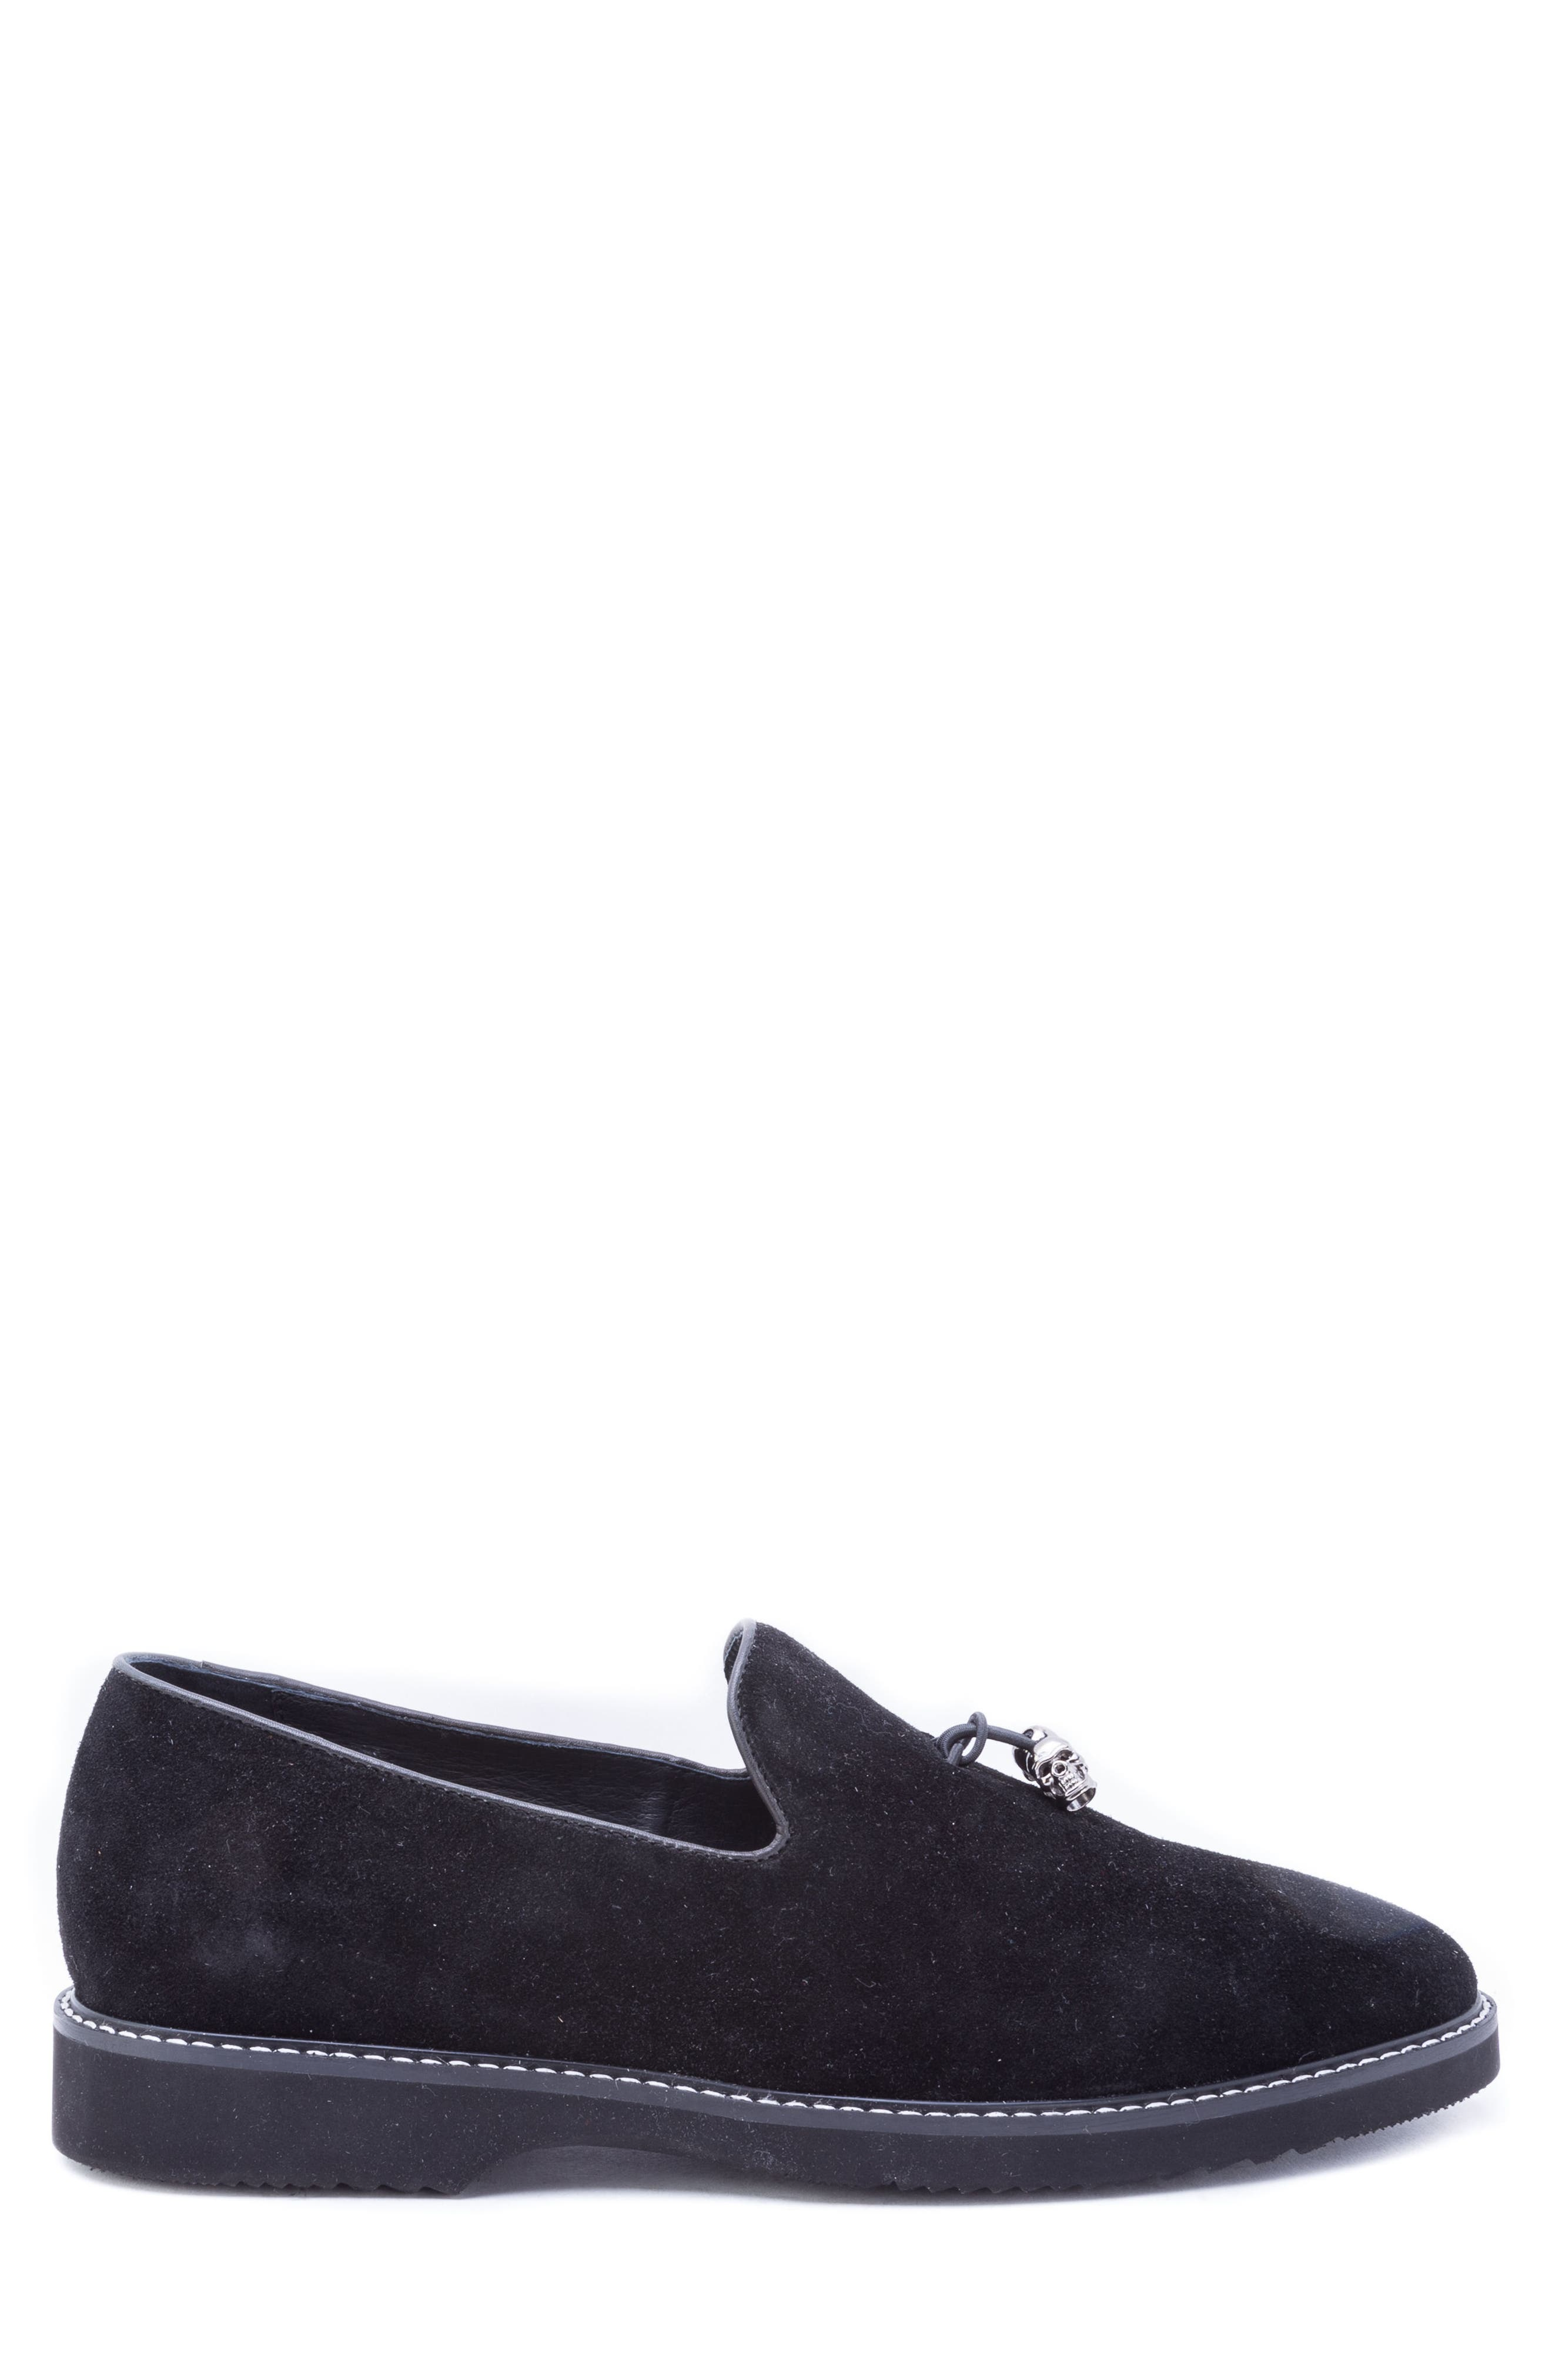 Heston Tassel Loafer,                             Alternate thumbnail 3, color,                             BLACK SUEDE